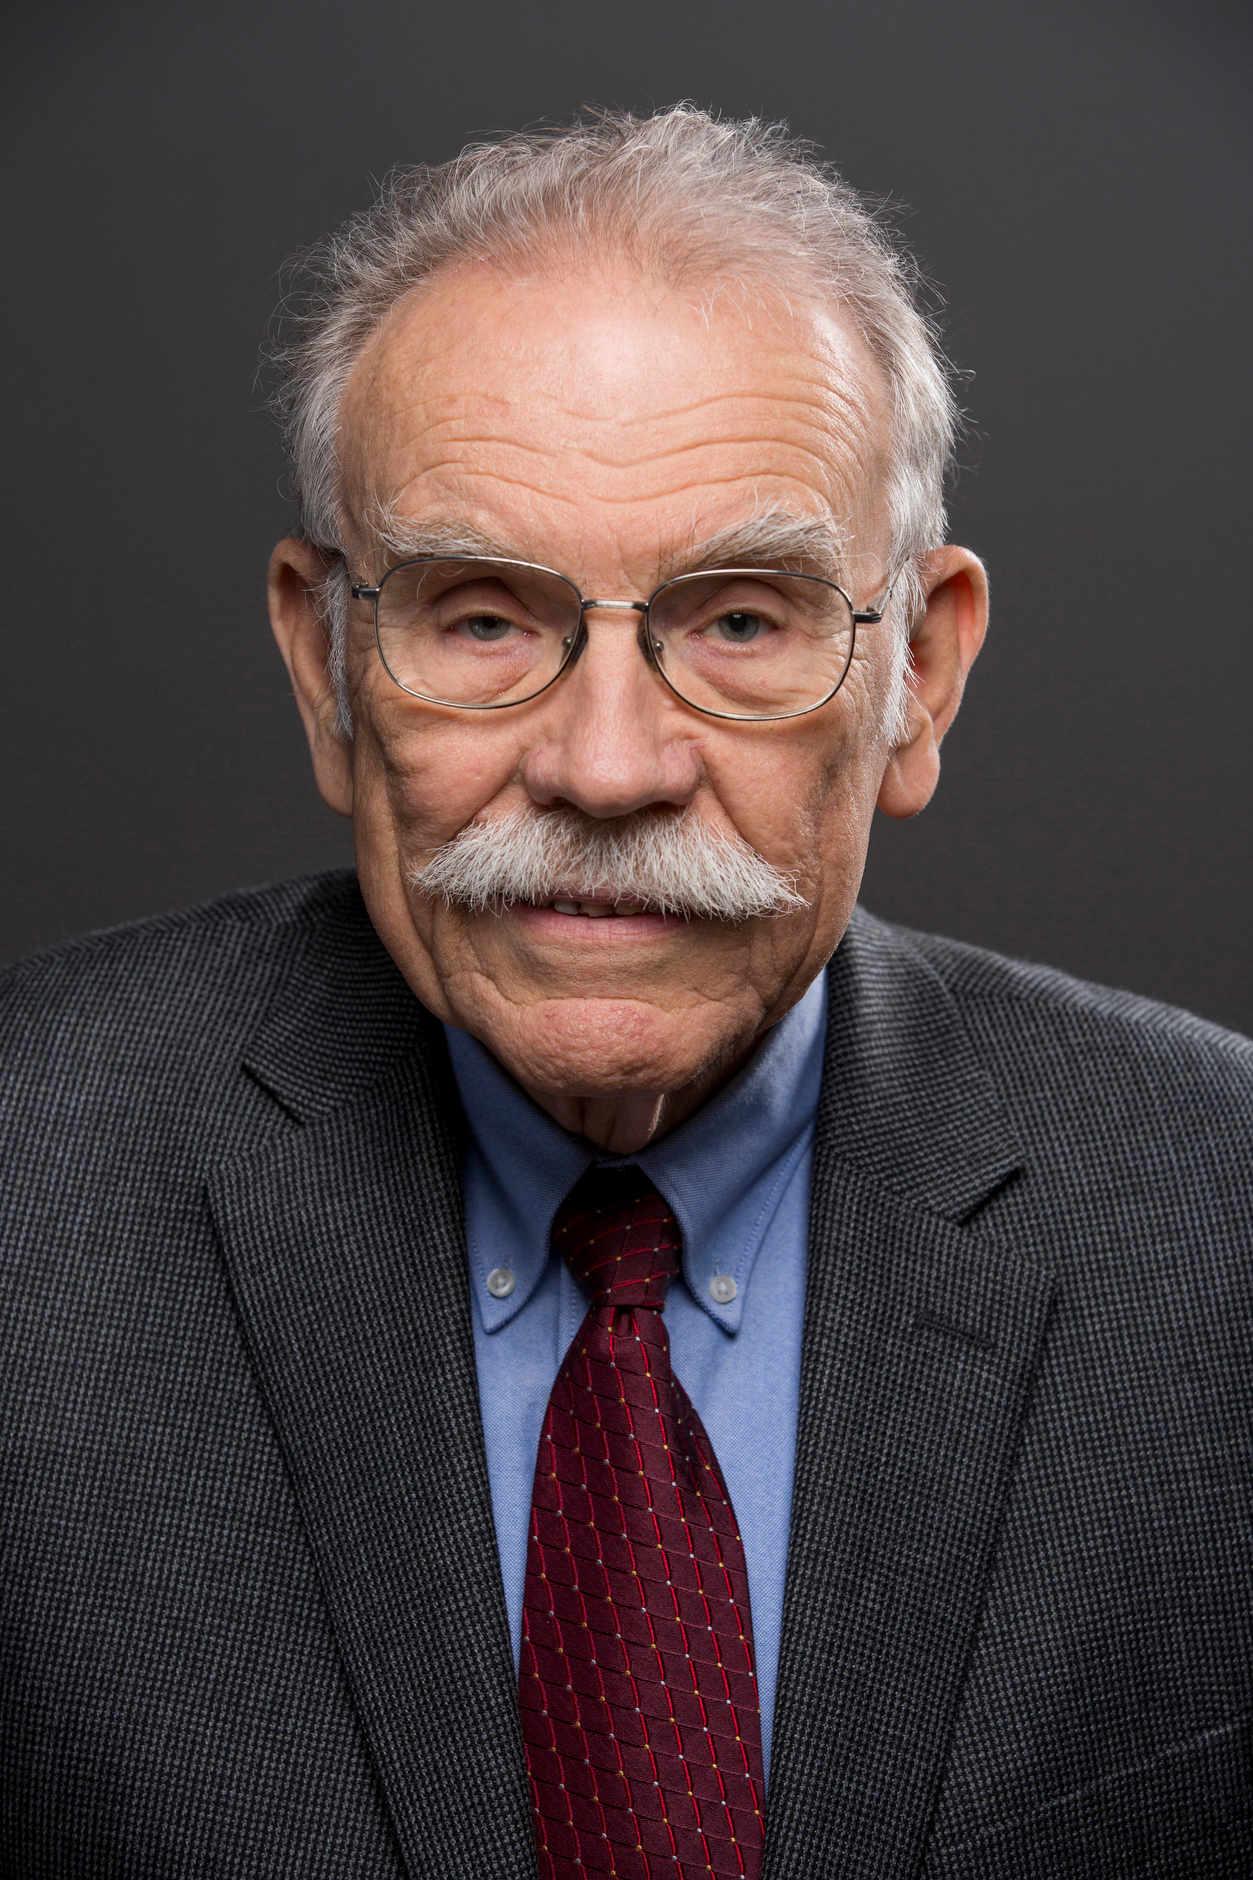 Indiana University Chancellor's Professor Emeritus John Mikesell – Bloomington, Indiana – Feb. 11, 2016. (Photo by James Brosher)